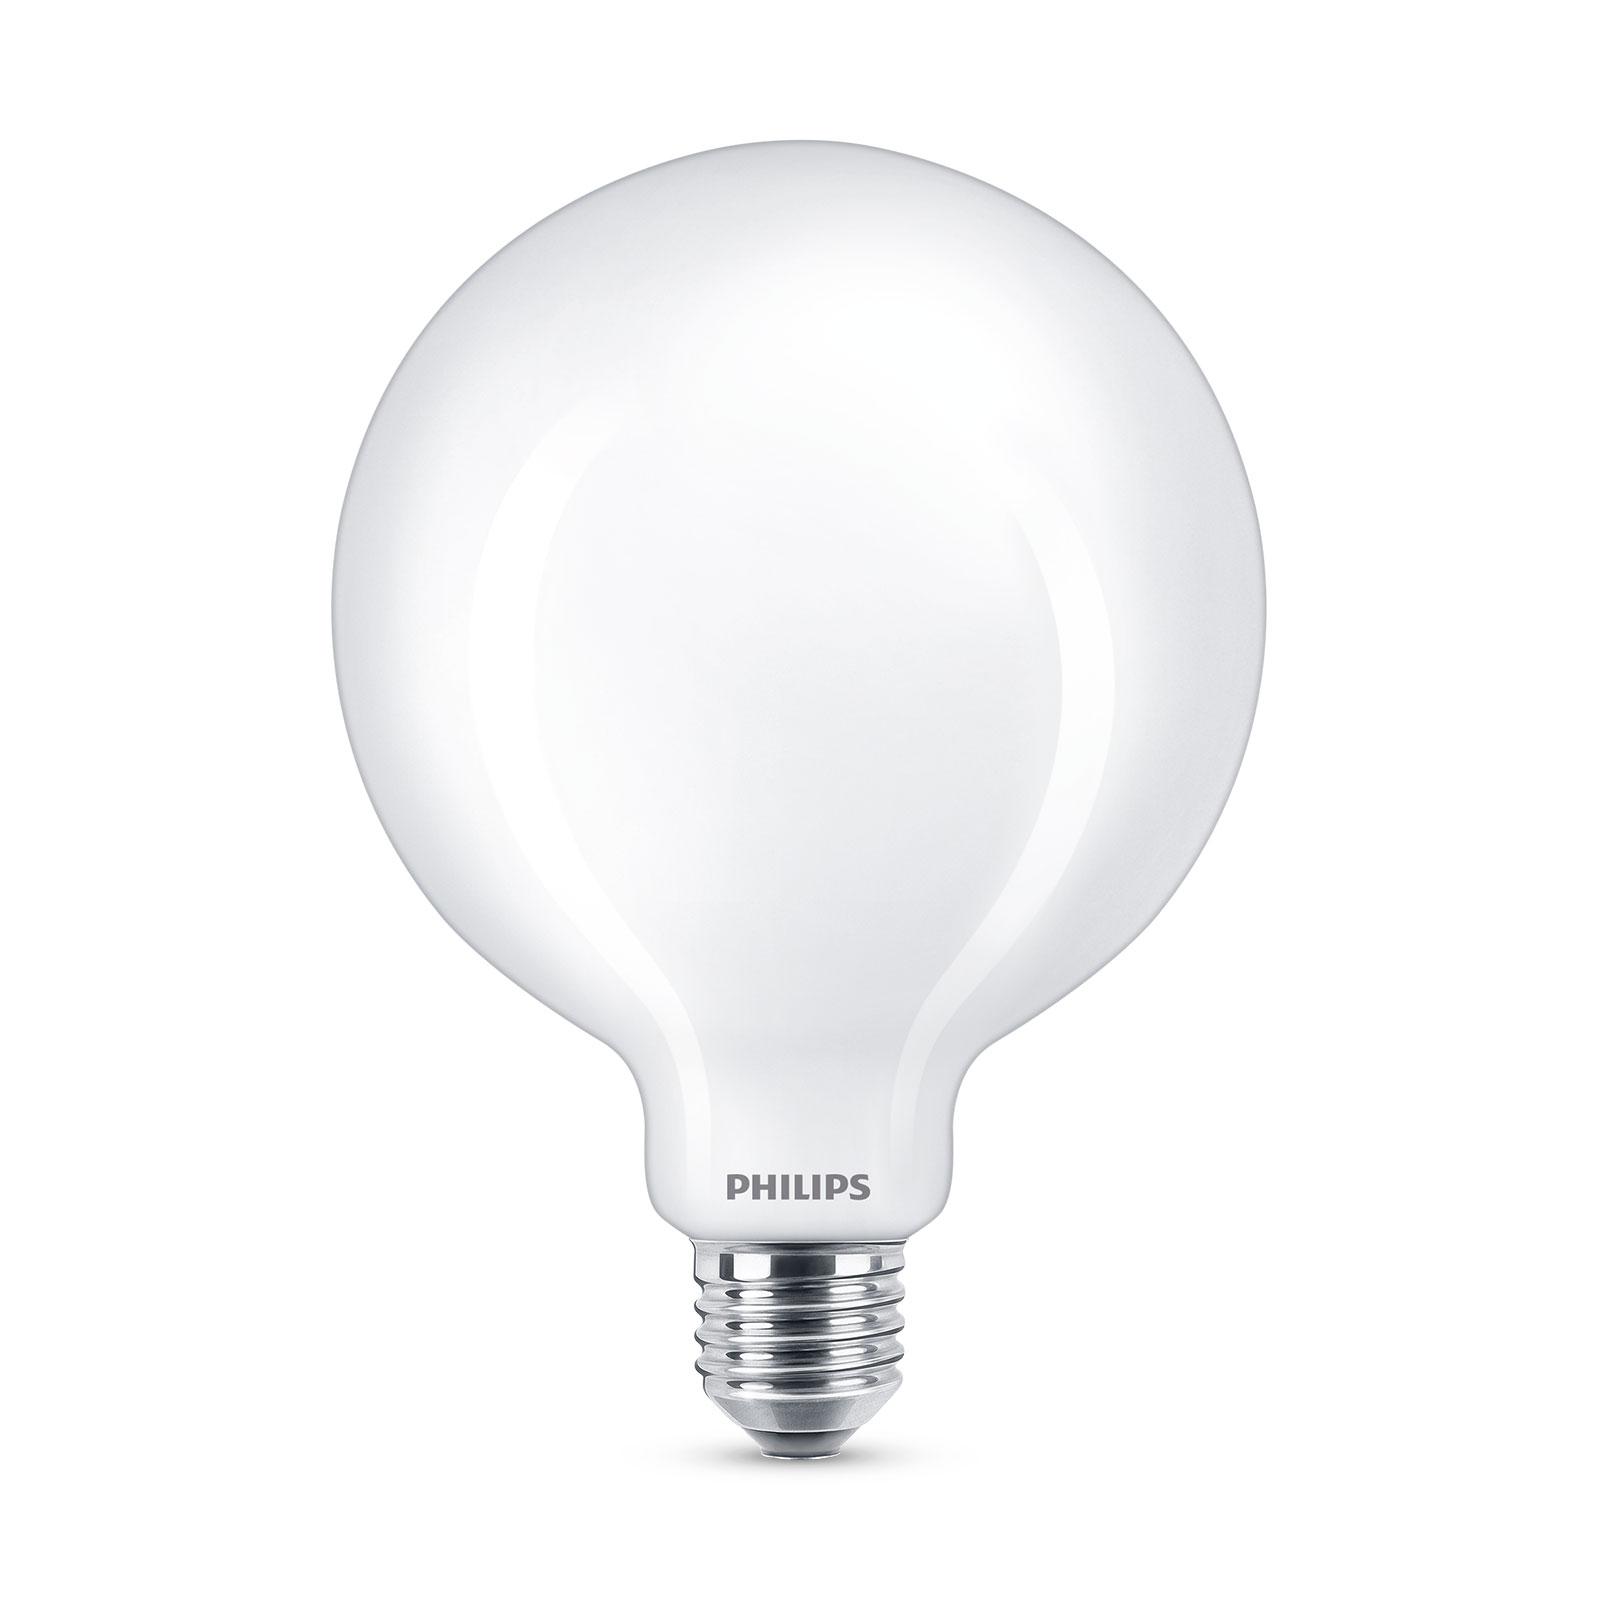 Philips Classic LED-Lampe E27 G120 7W 2.700K opal